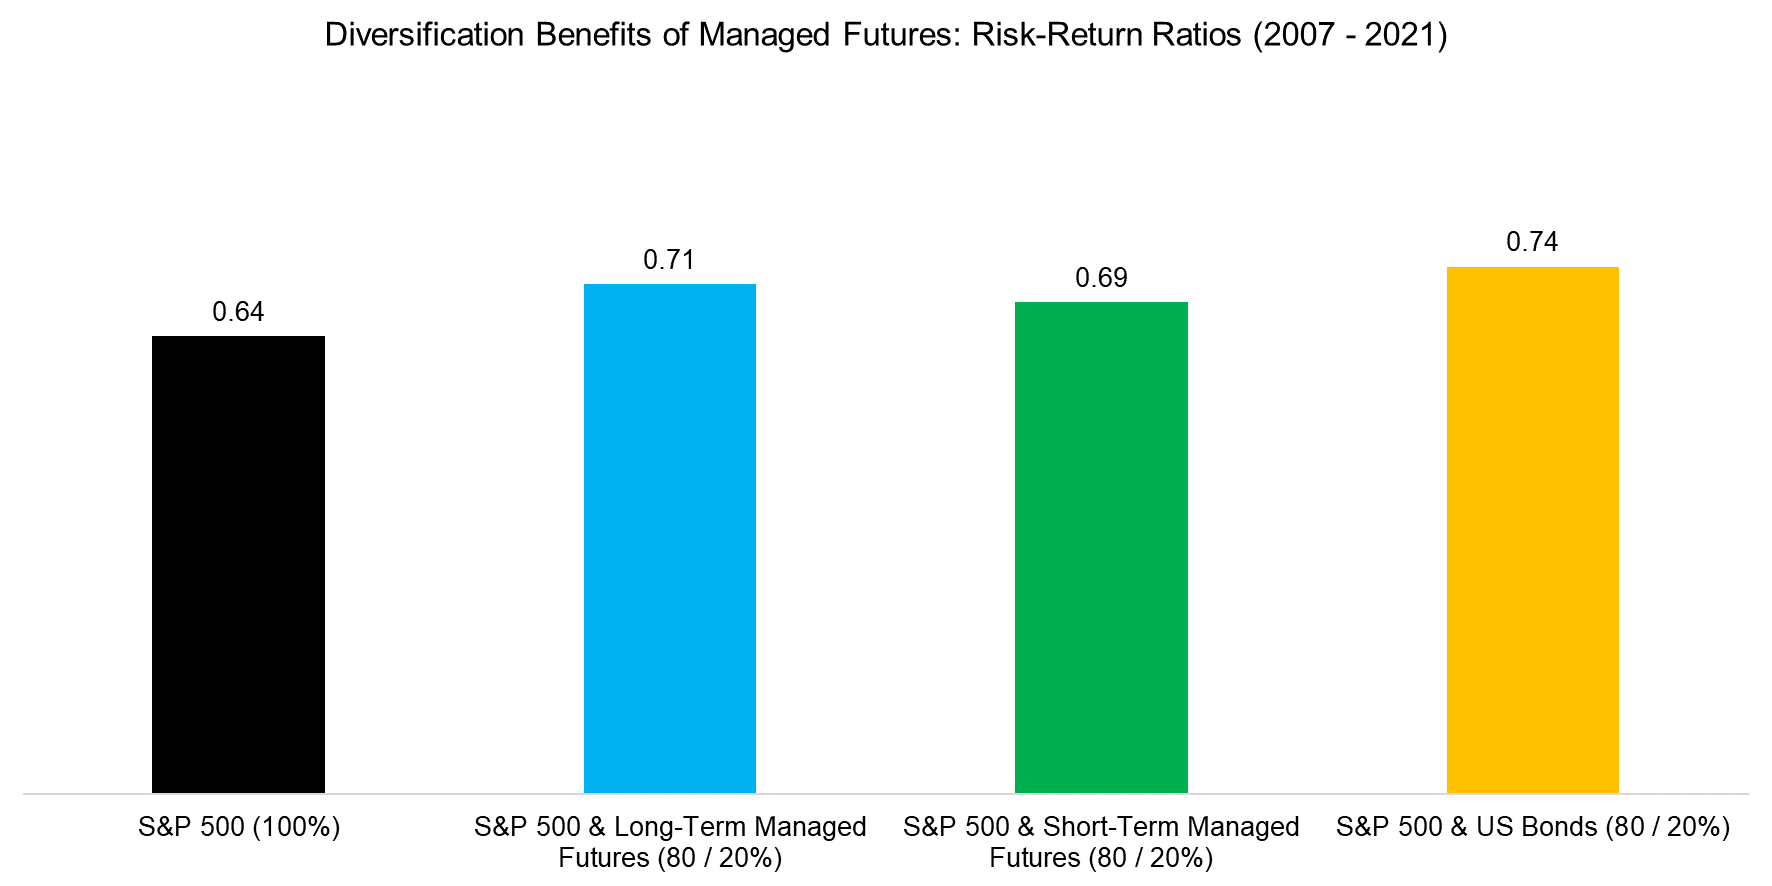 Diversification Benefits of Managed Futures Risk-Return Ratios (2007 - 2021)